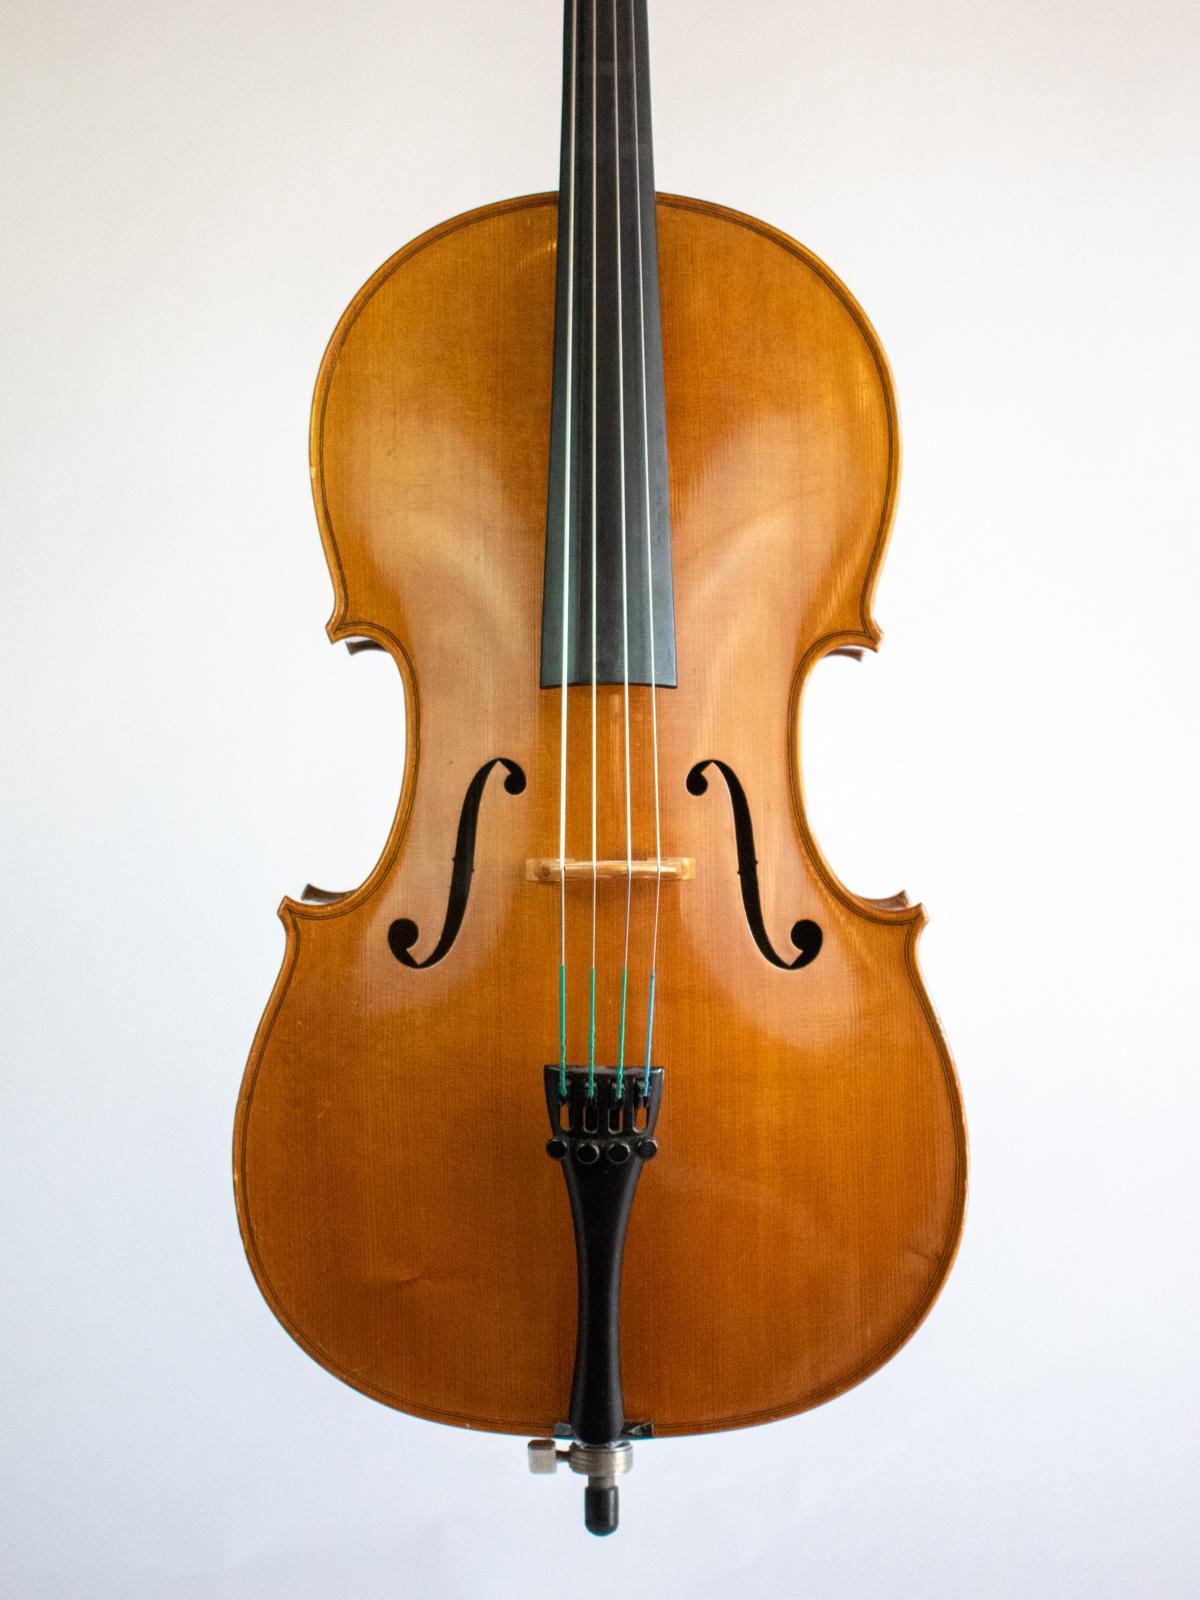 Made for Leah D. Metzler 1/8 cello